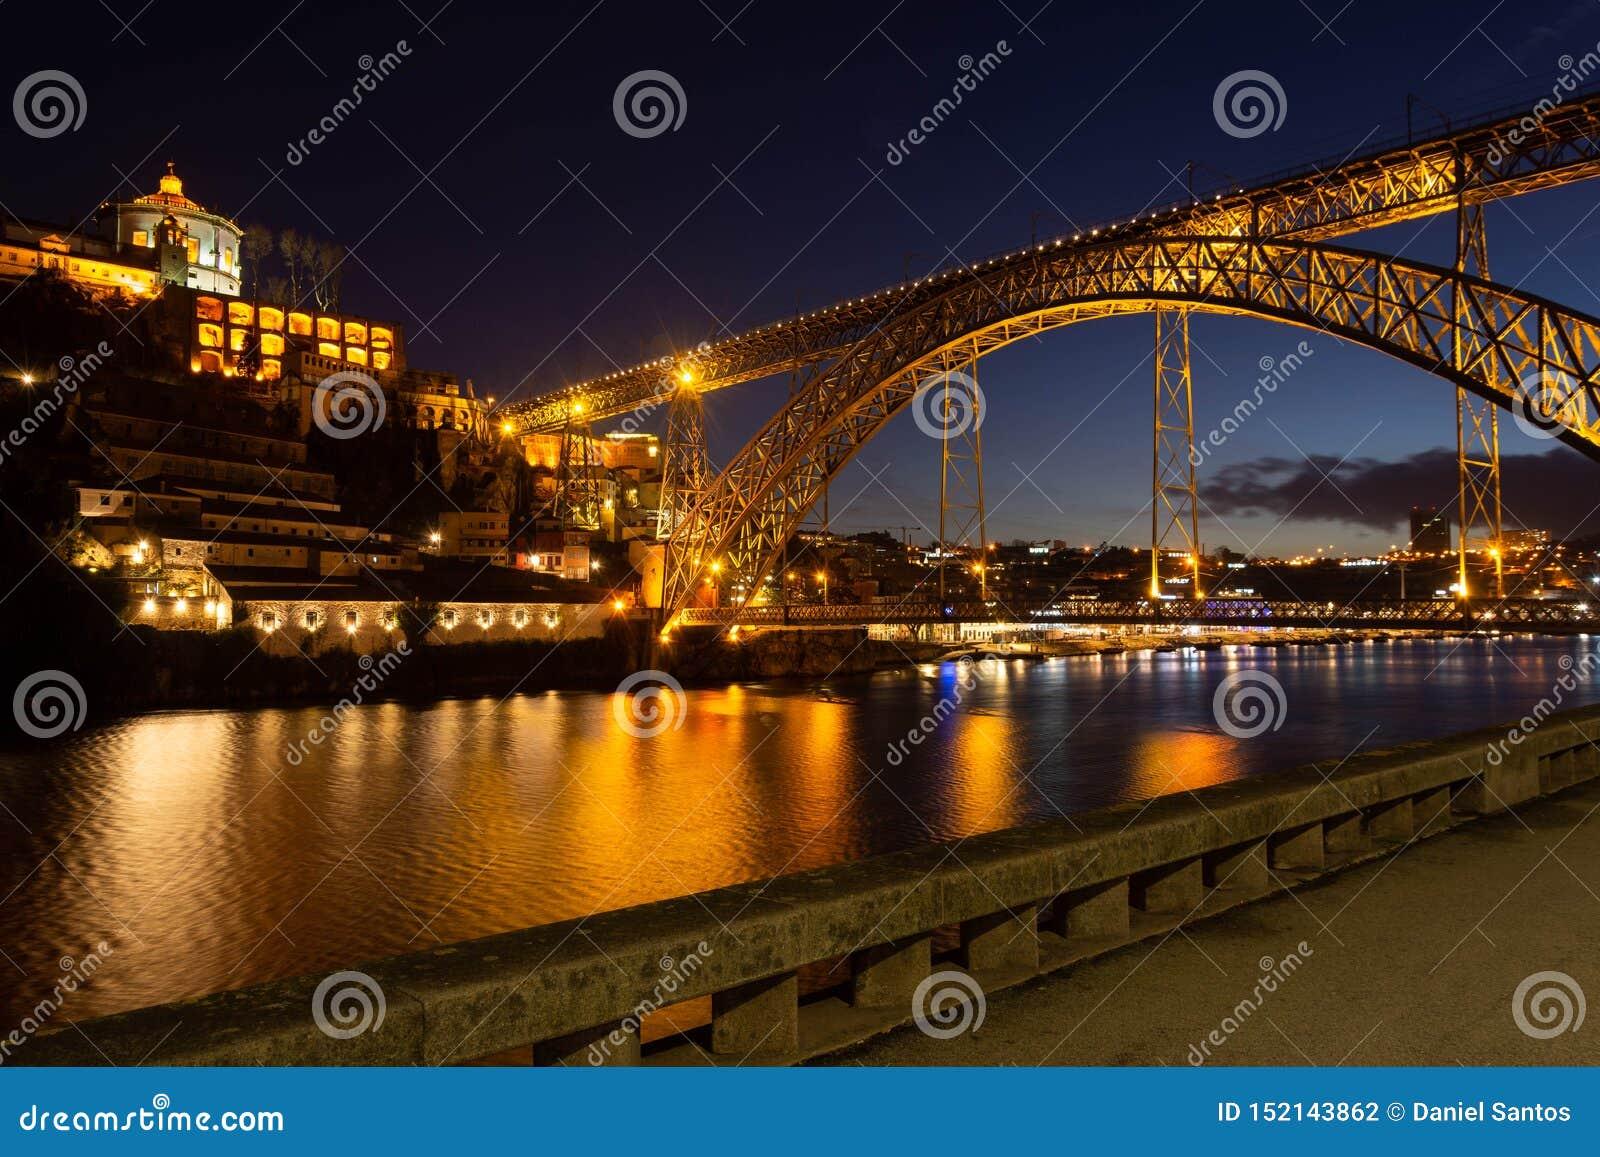 D Den Luis I bron exponerade på natten Douro flod bridge stadskonstruktionsdouroen ?ver den delporto portugal floden